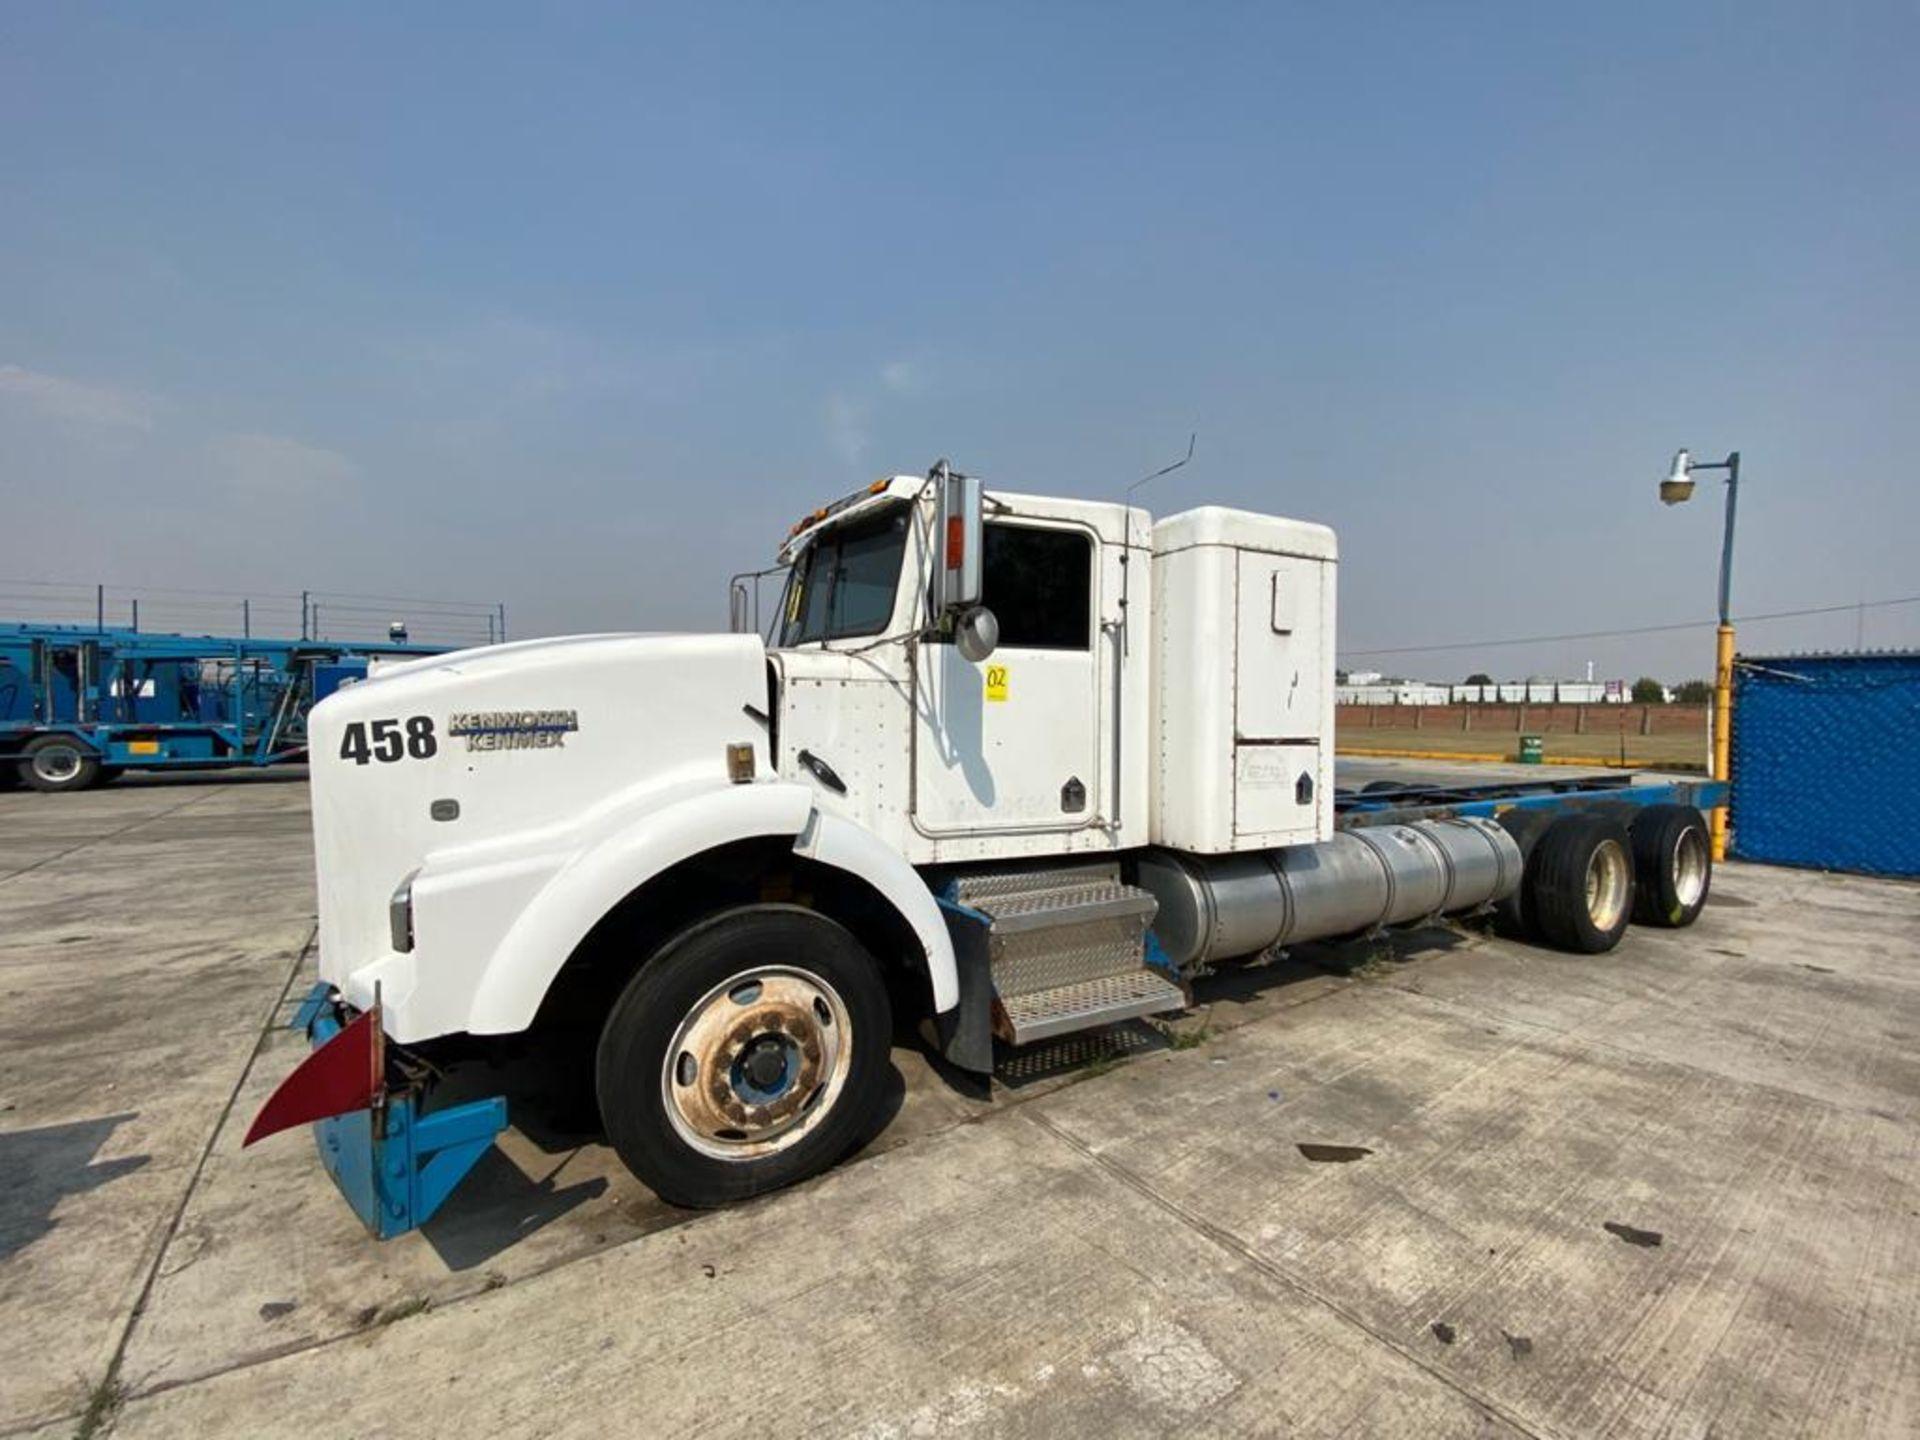 1999 Kenworth Sleeper truck tractor, standard transmission of 18 speeds - Image 10 of 75